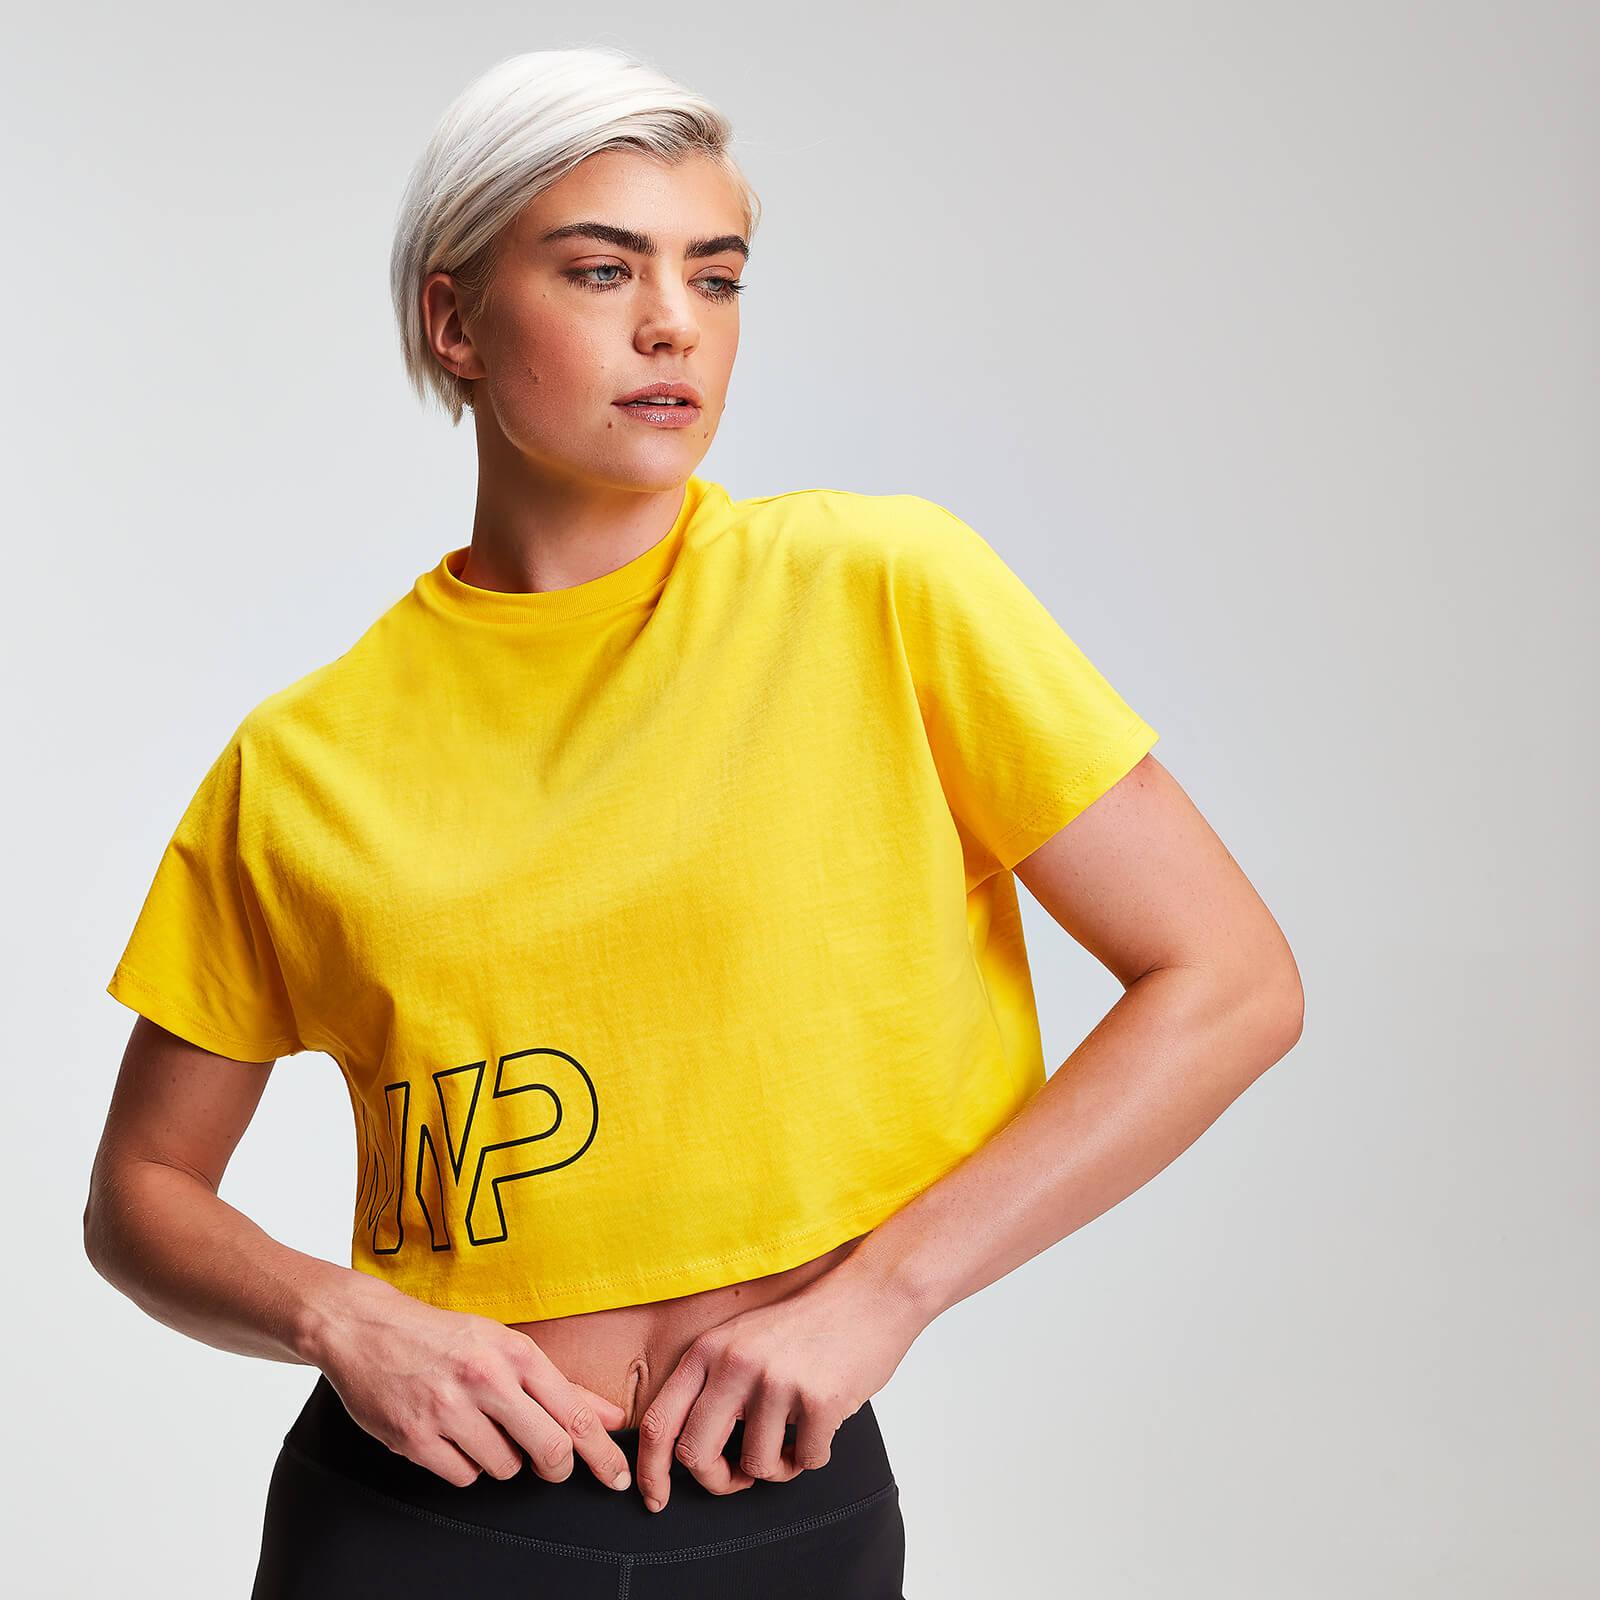 Myprotein Naisten MP Power Cropped T-Paita - Buttercup - M